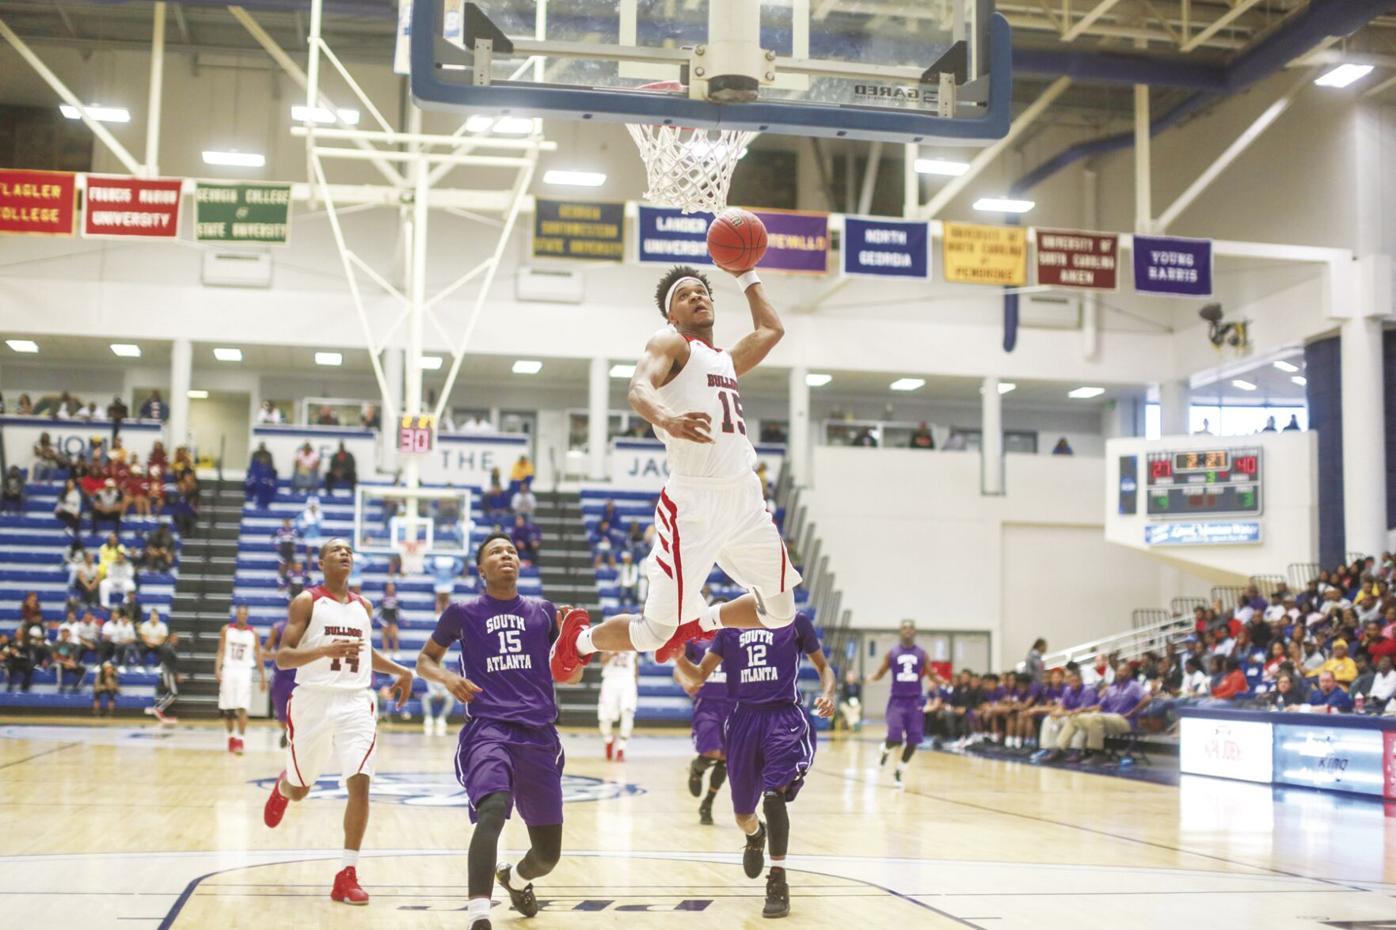 Jailyn Ingram goes up for a slam dunk-Josiah Connelly edit.jpg